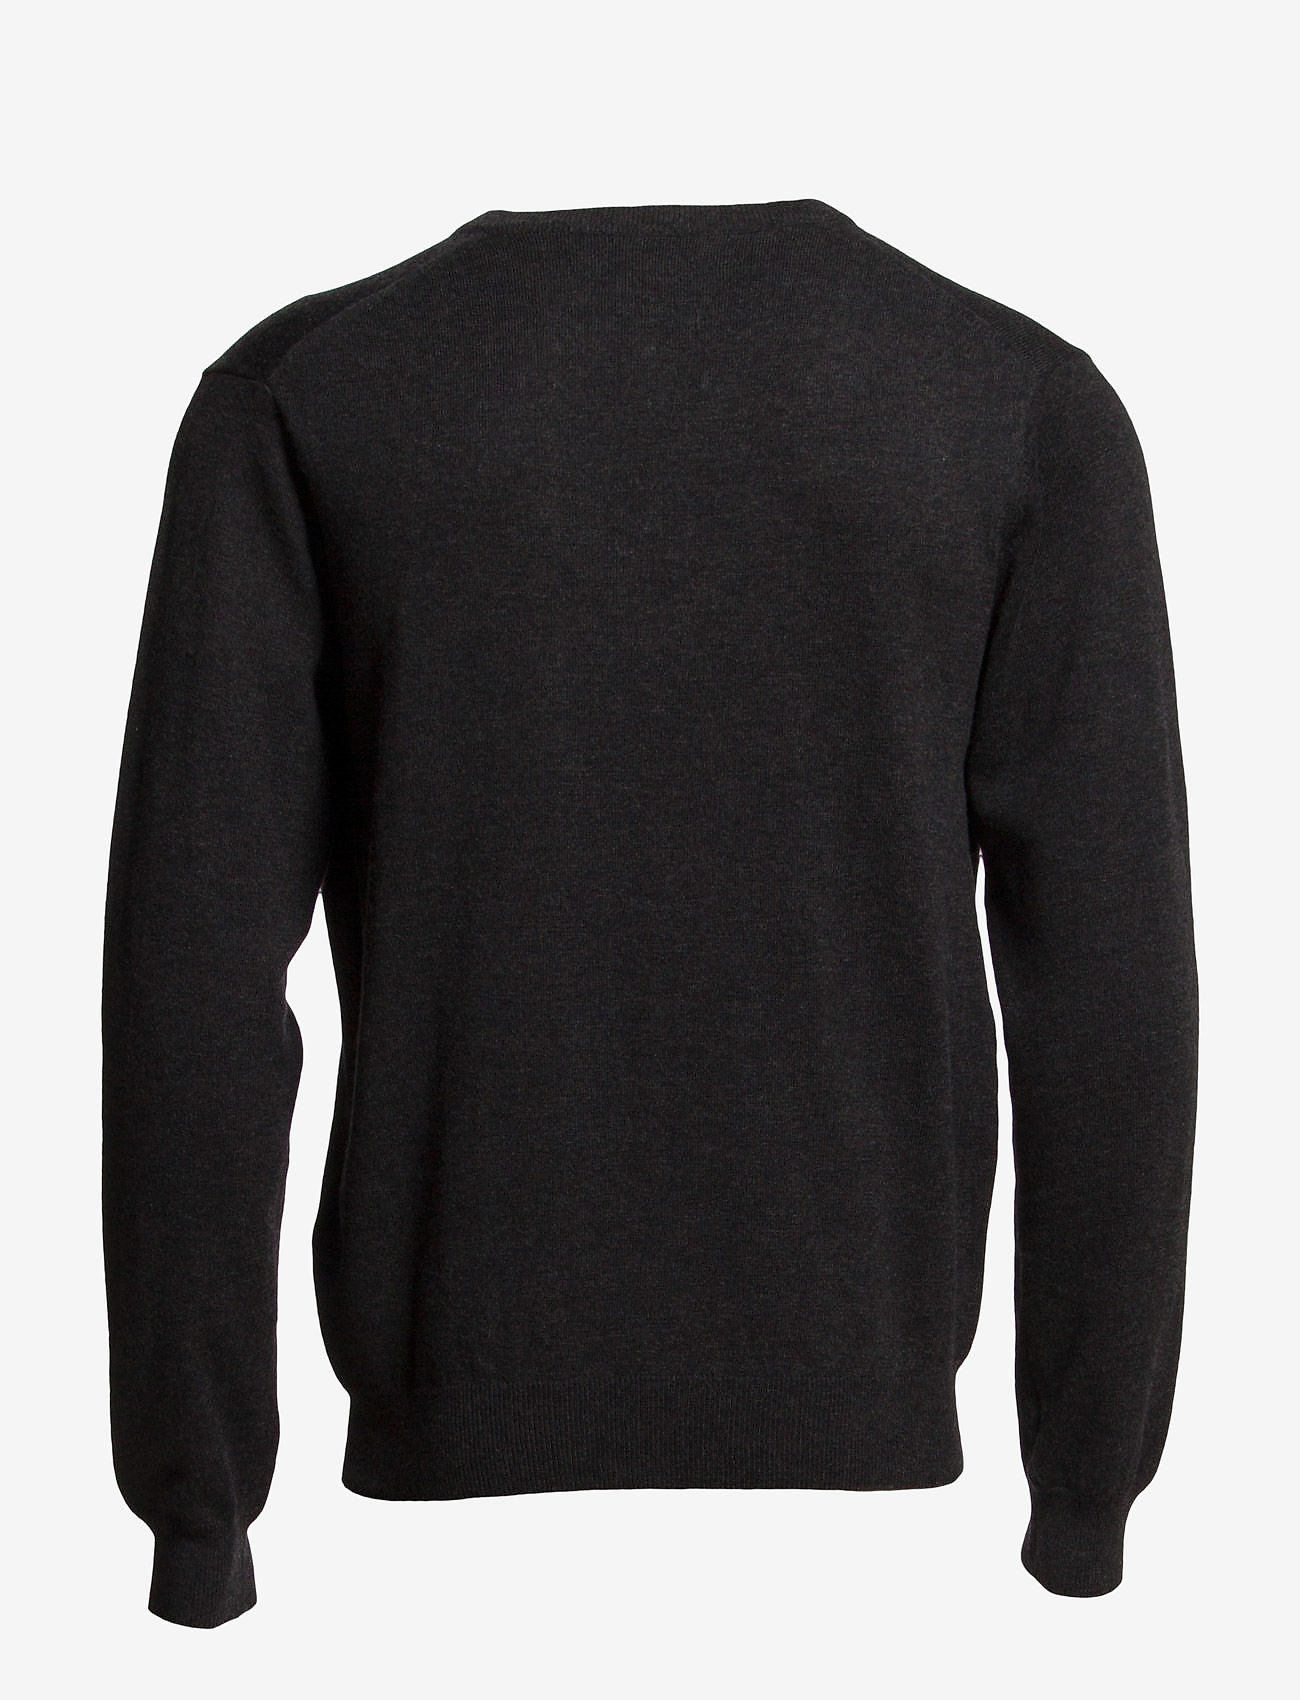 GANT - COTTON WOOL V-NECK - knitted v-necks - dk charcoal melange - 1